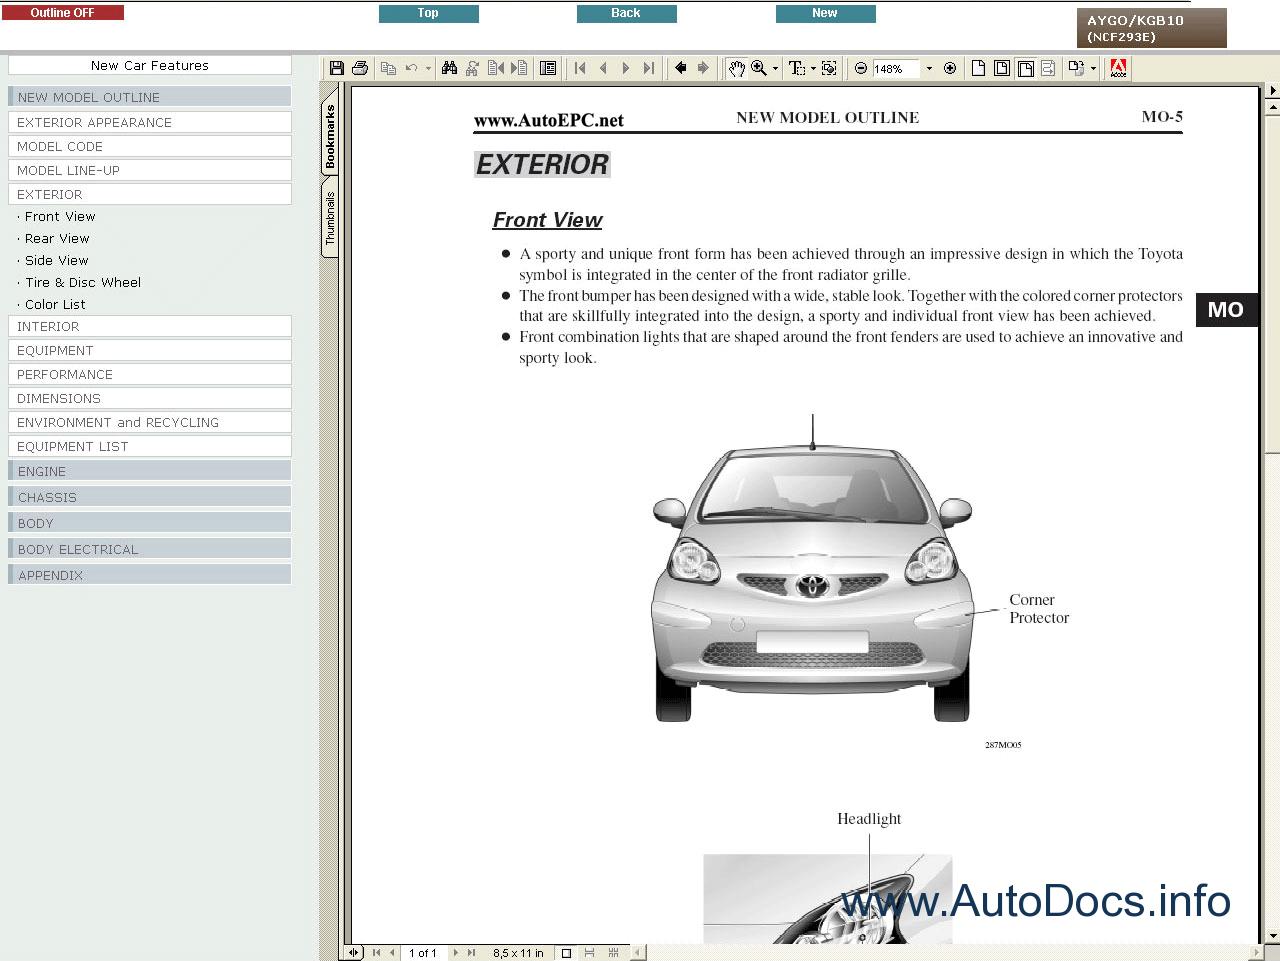 Main / Catalog / Cars Repair Manuals / Toyota Aygo Service Manual